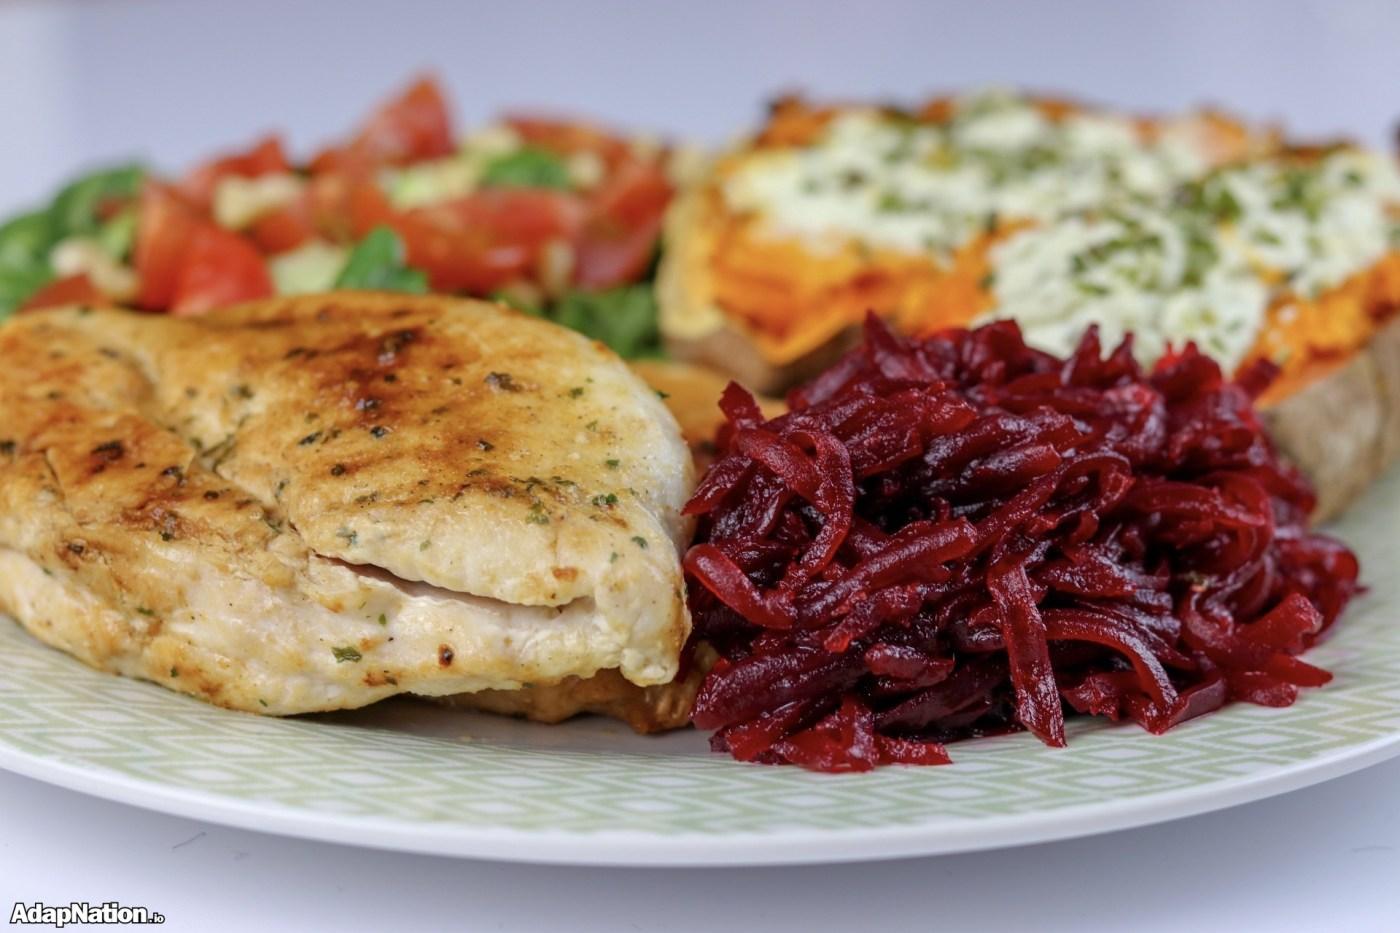 Pan Fried Chicken, Loaded Sweet Potato Jacket, Salad & Smoky Beetroot